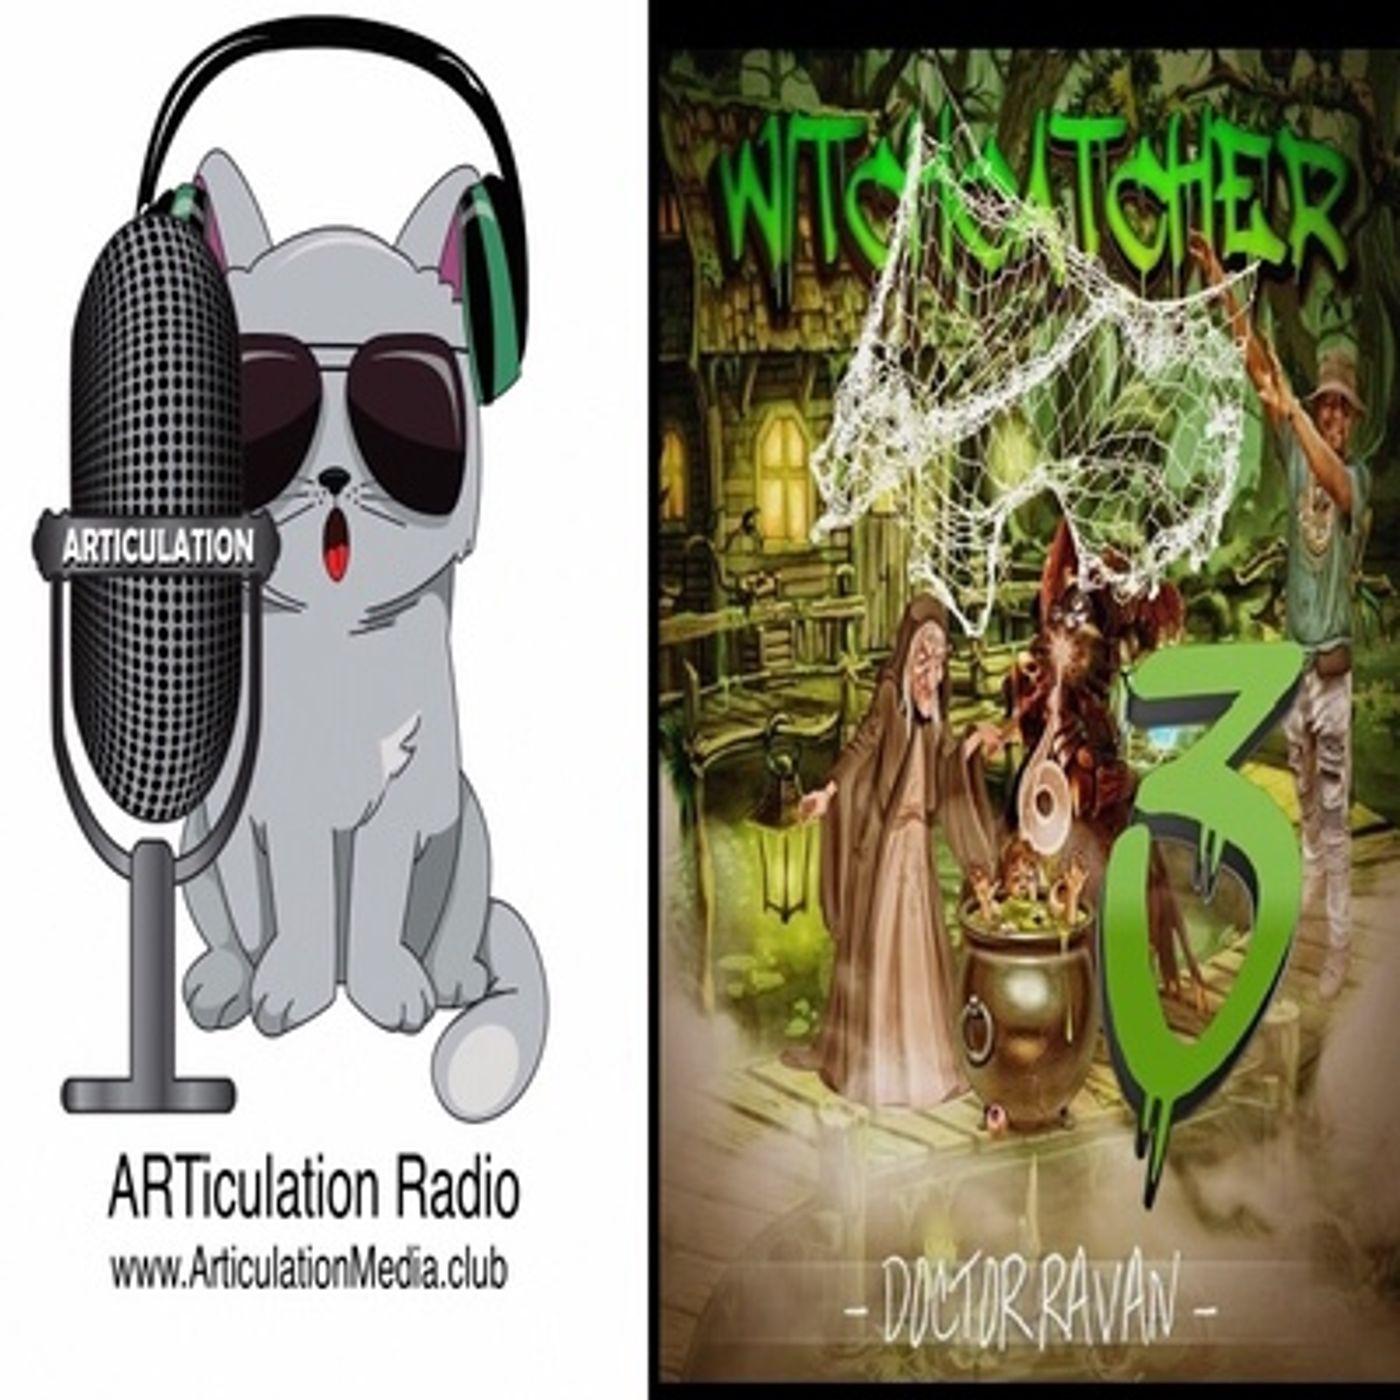 ARTiculation Radio — CONSCIOUS HIP-HOP CONSCIENCE (interview w/ Doctor Ravan)